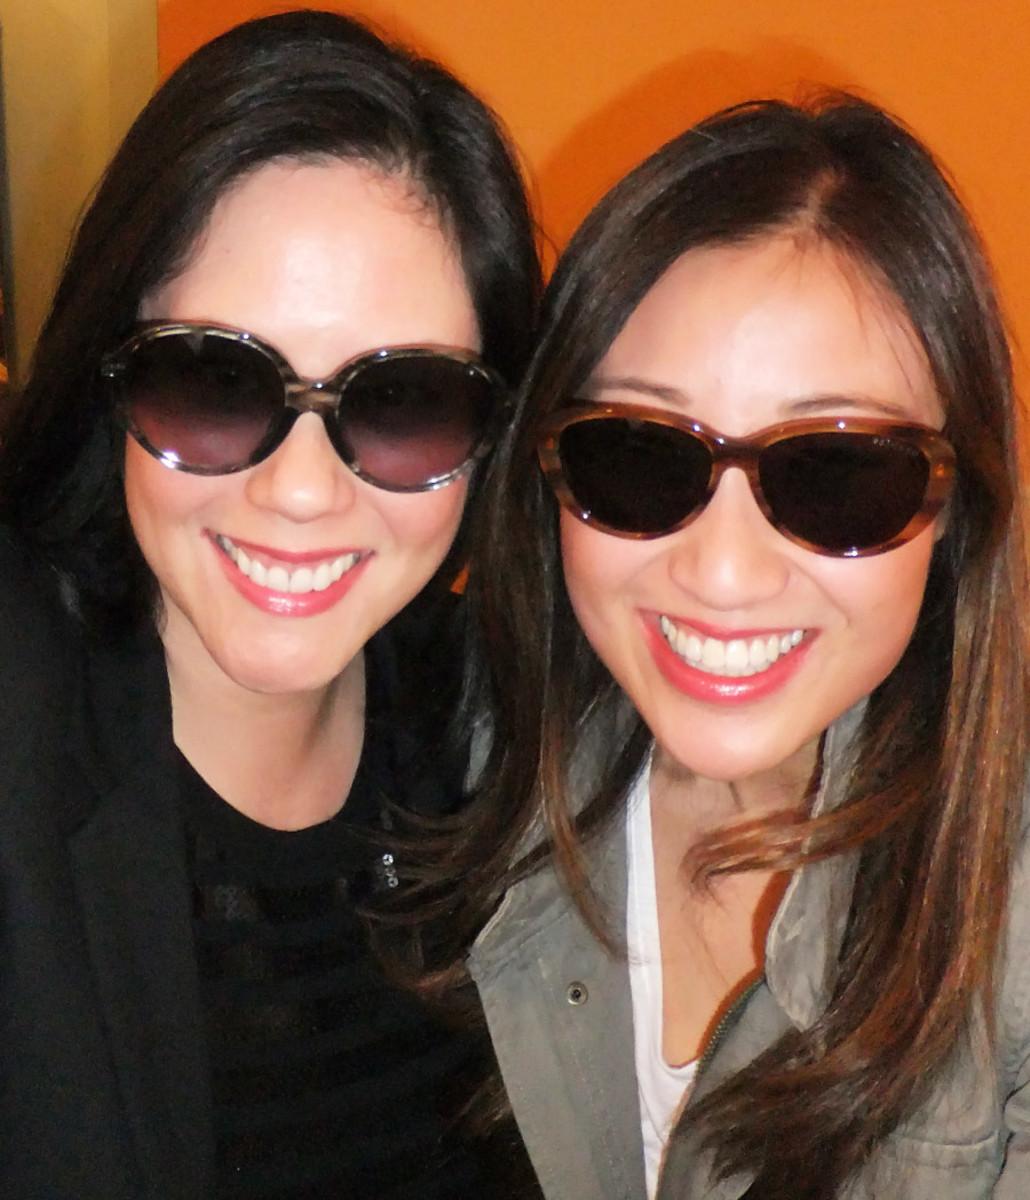 KayTran sunglasses